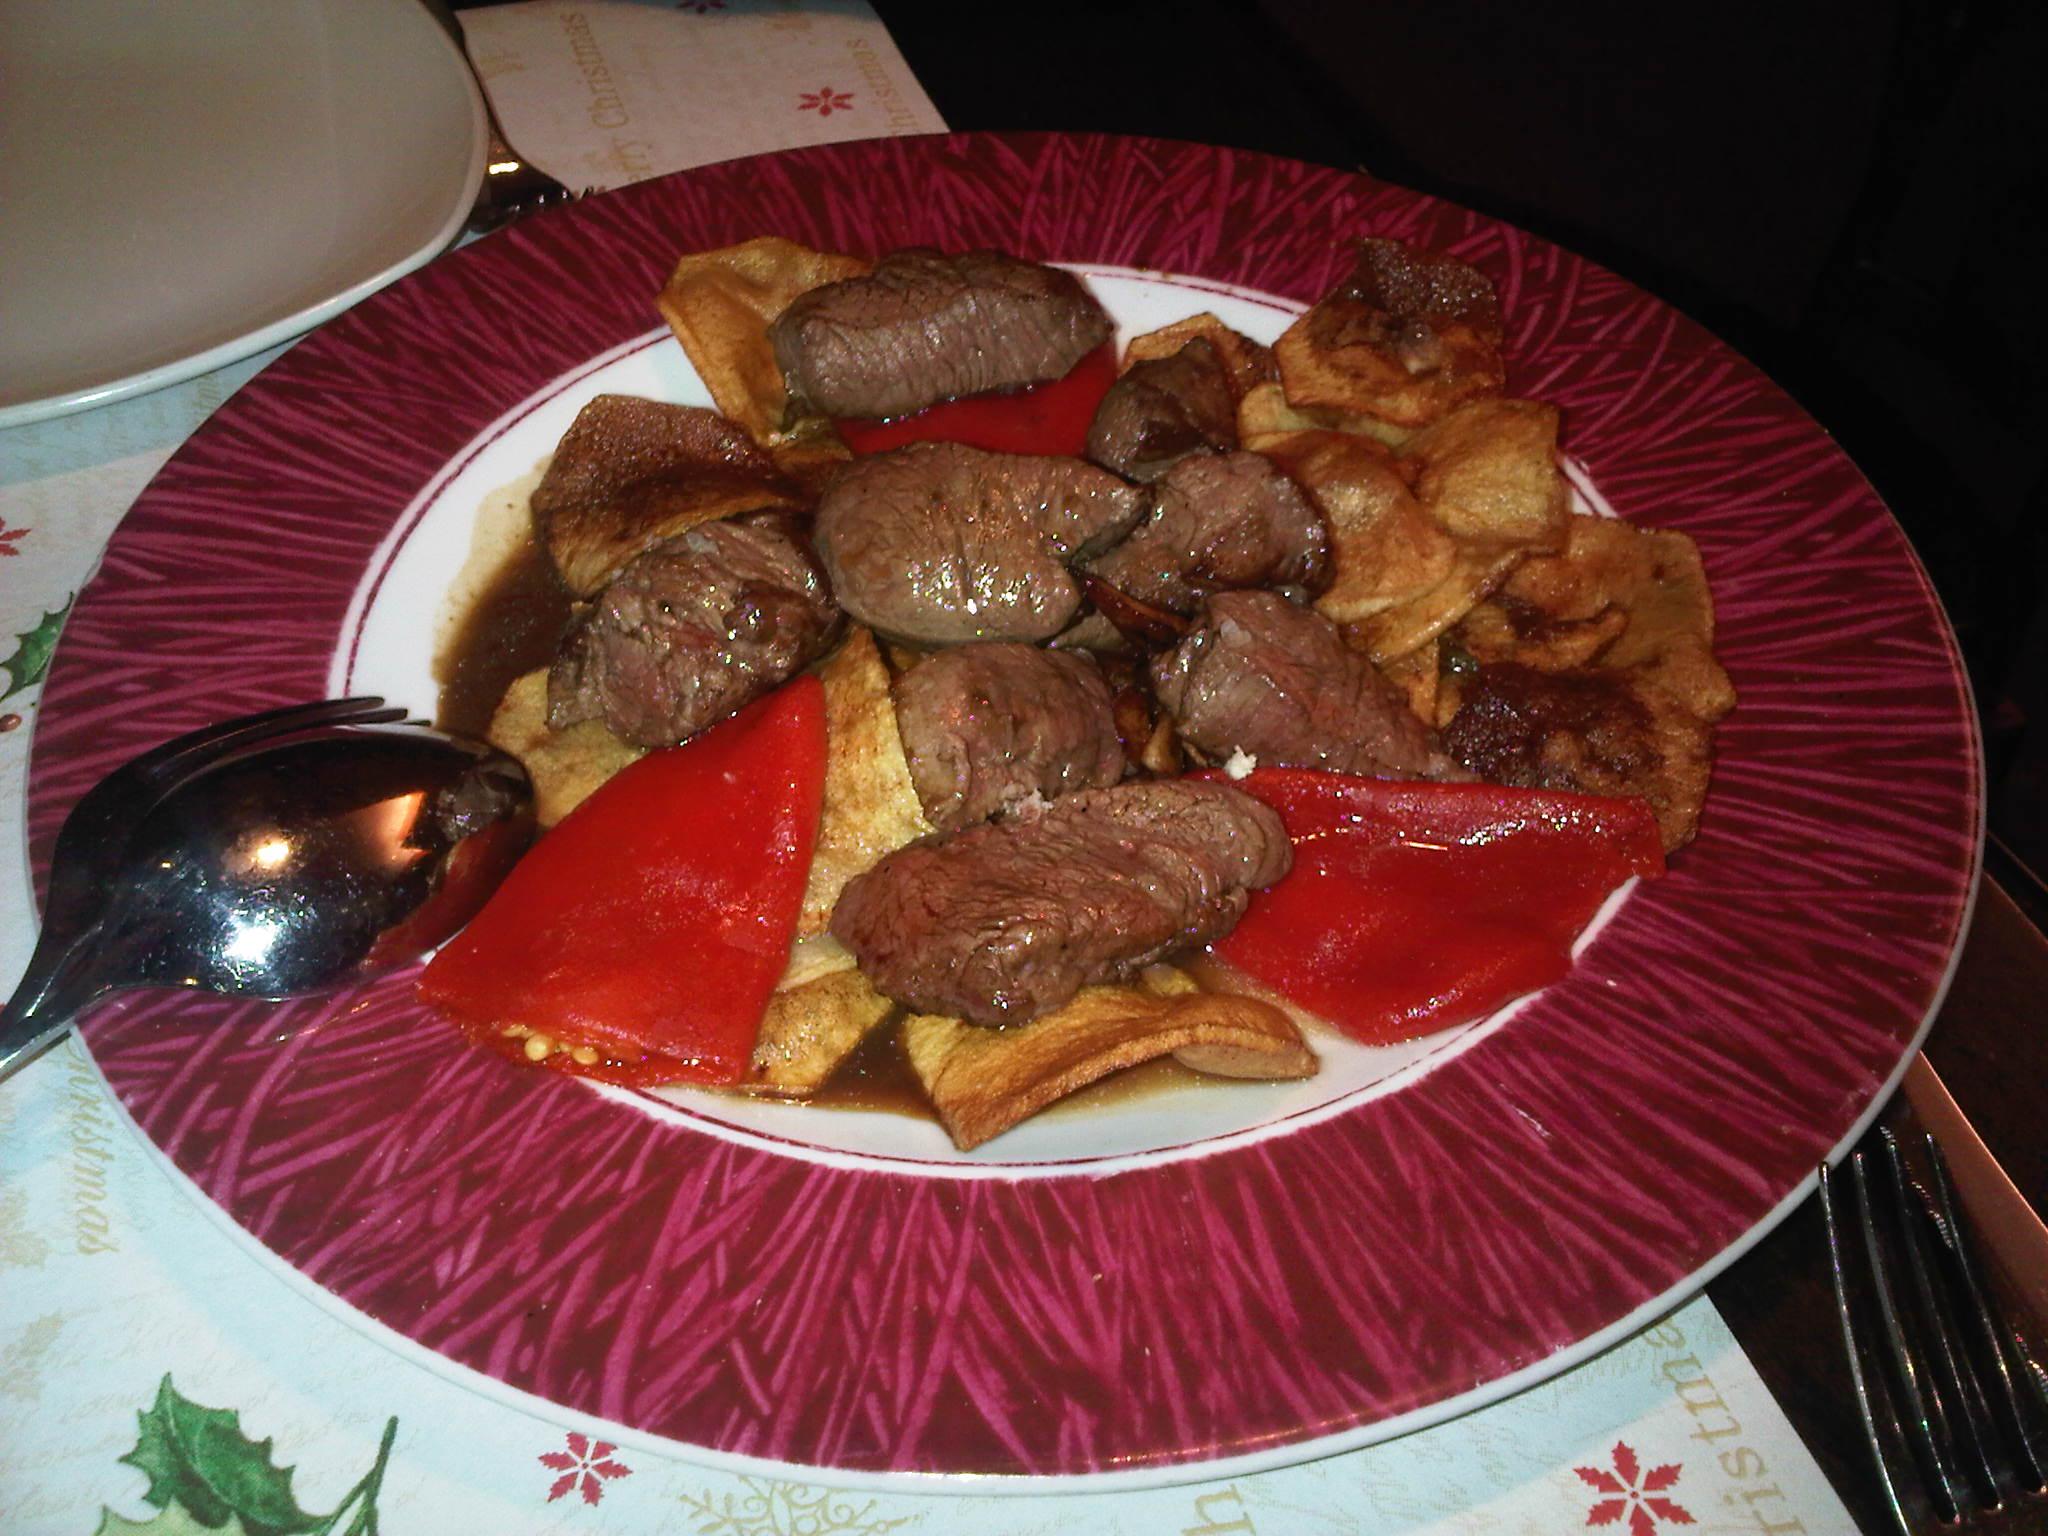 Restaurante_Palomeque_Zaragoza_Tacos_Solomillo_Aurelio_Gómez-Miranda